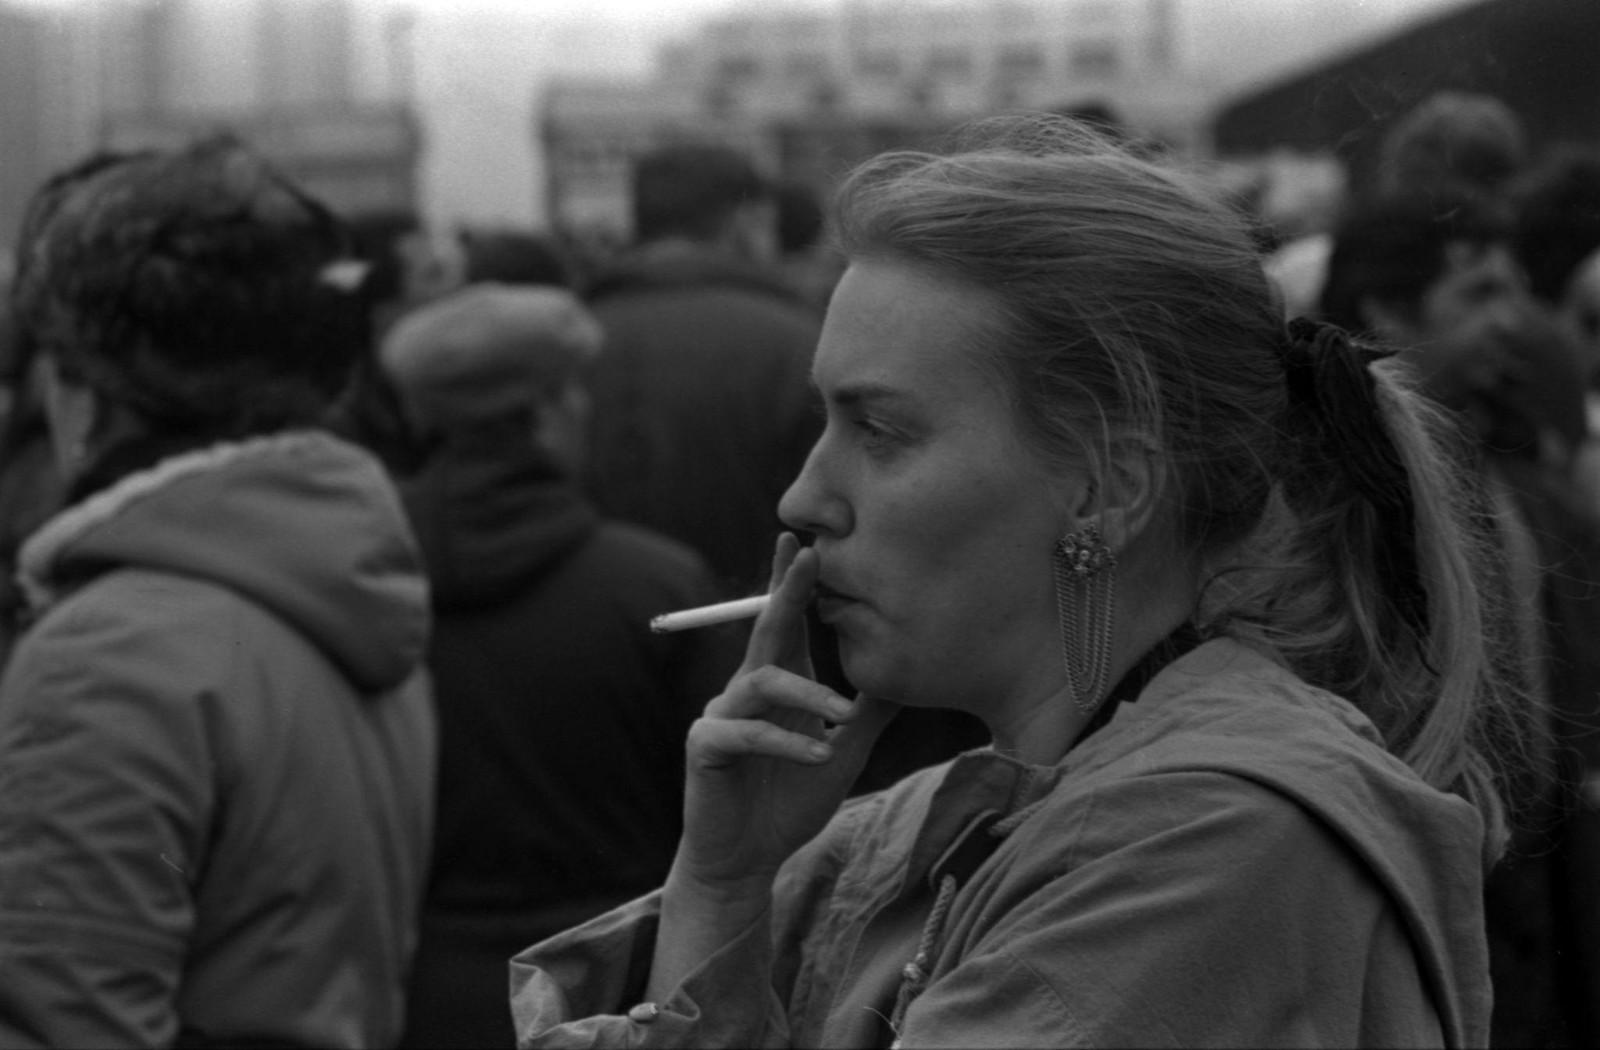 1989.  Братеево, Митинг в поддержку Бориса Ельцина